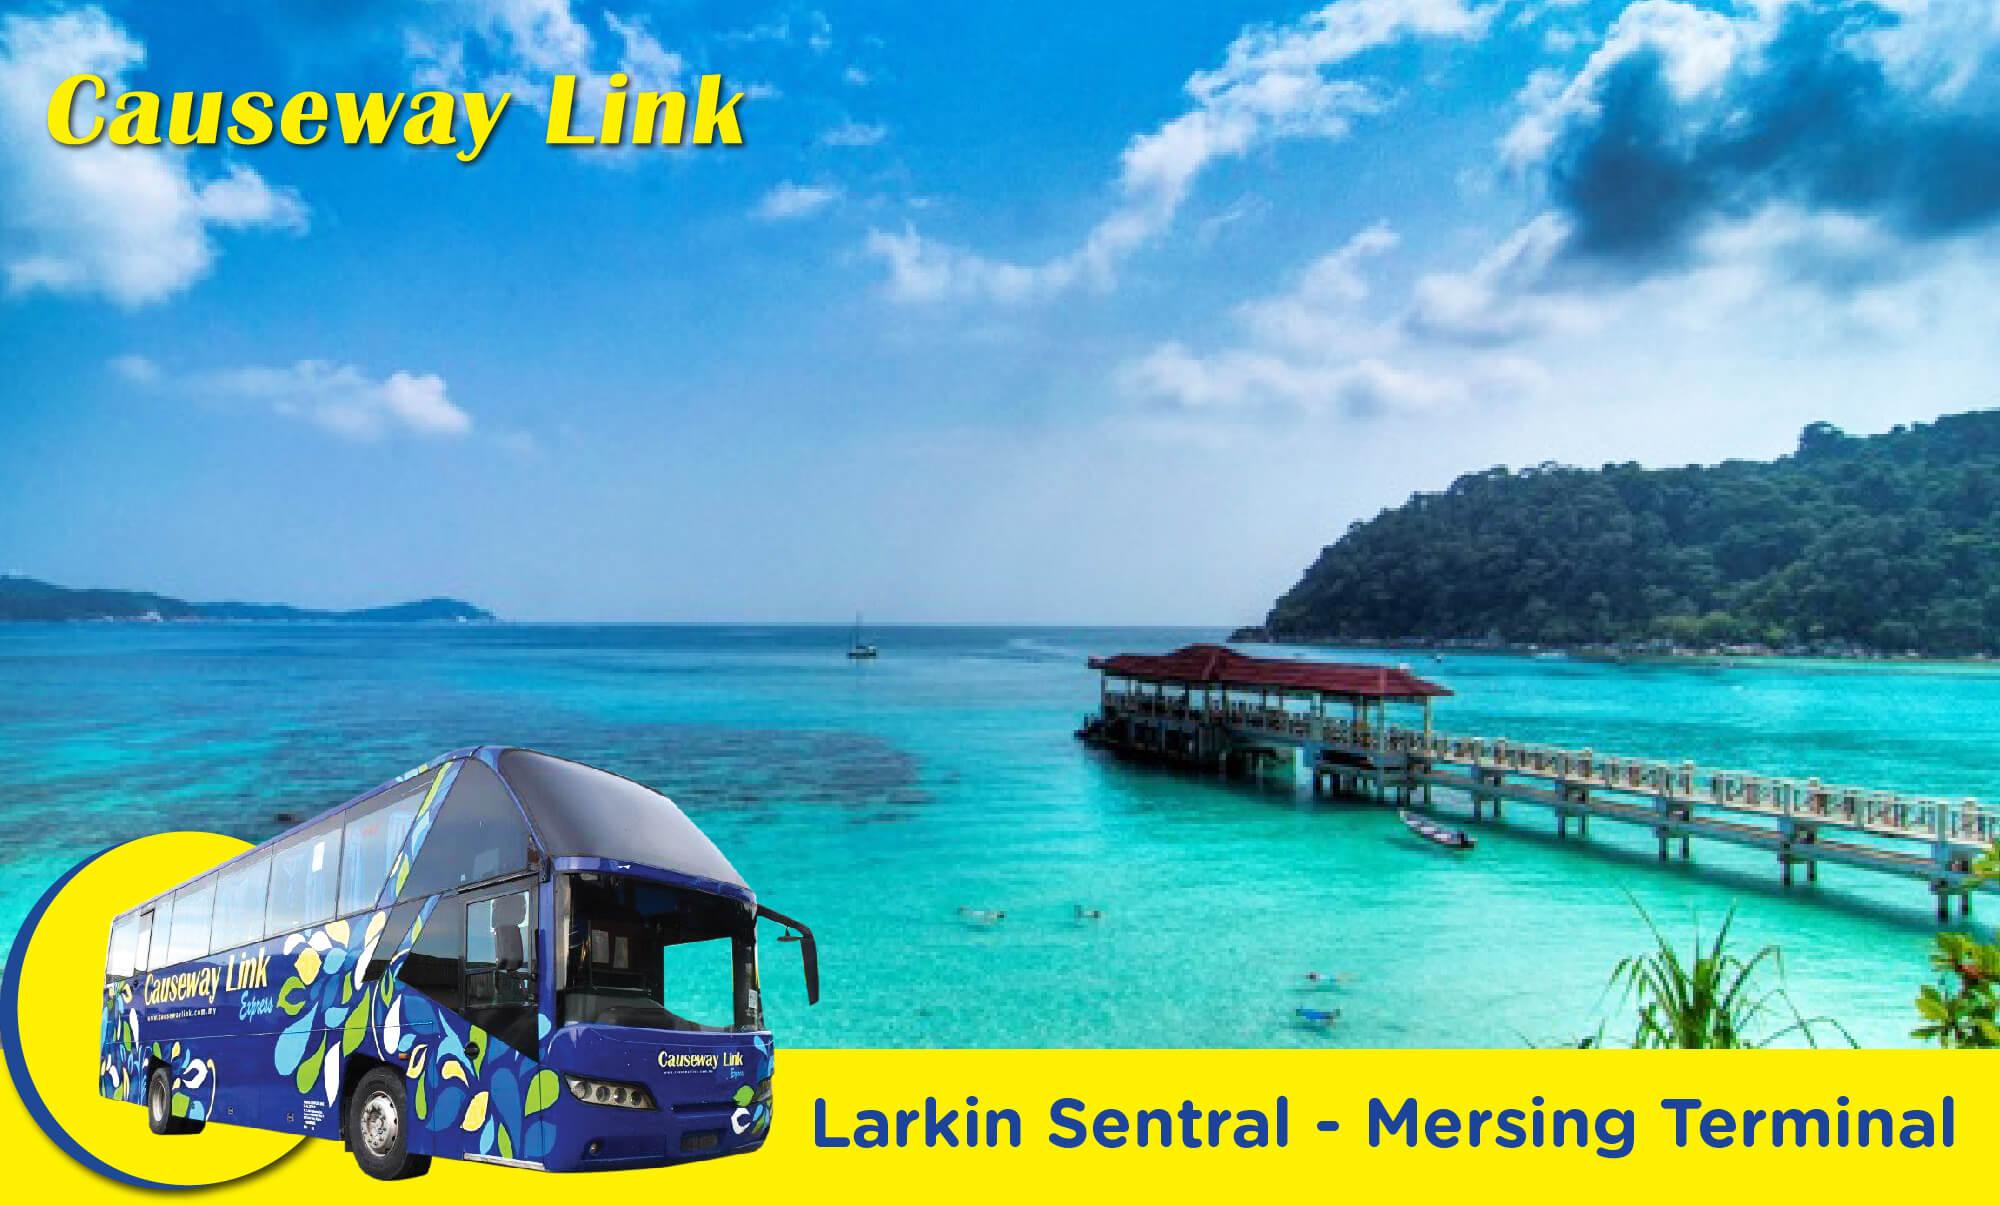 Causeway Link Express Bus between Larkin and Mersing